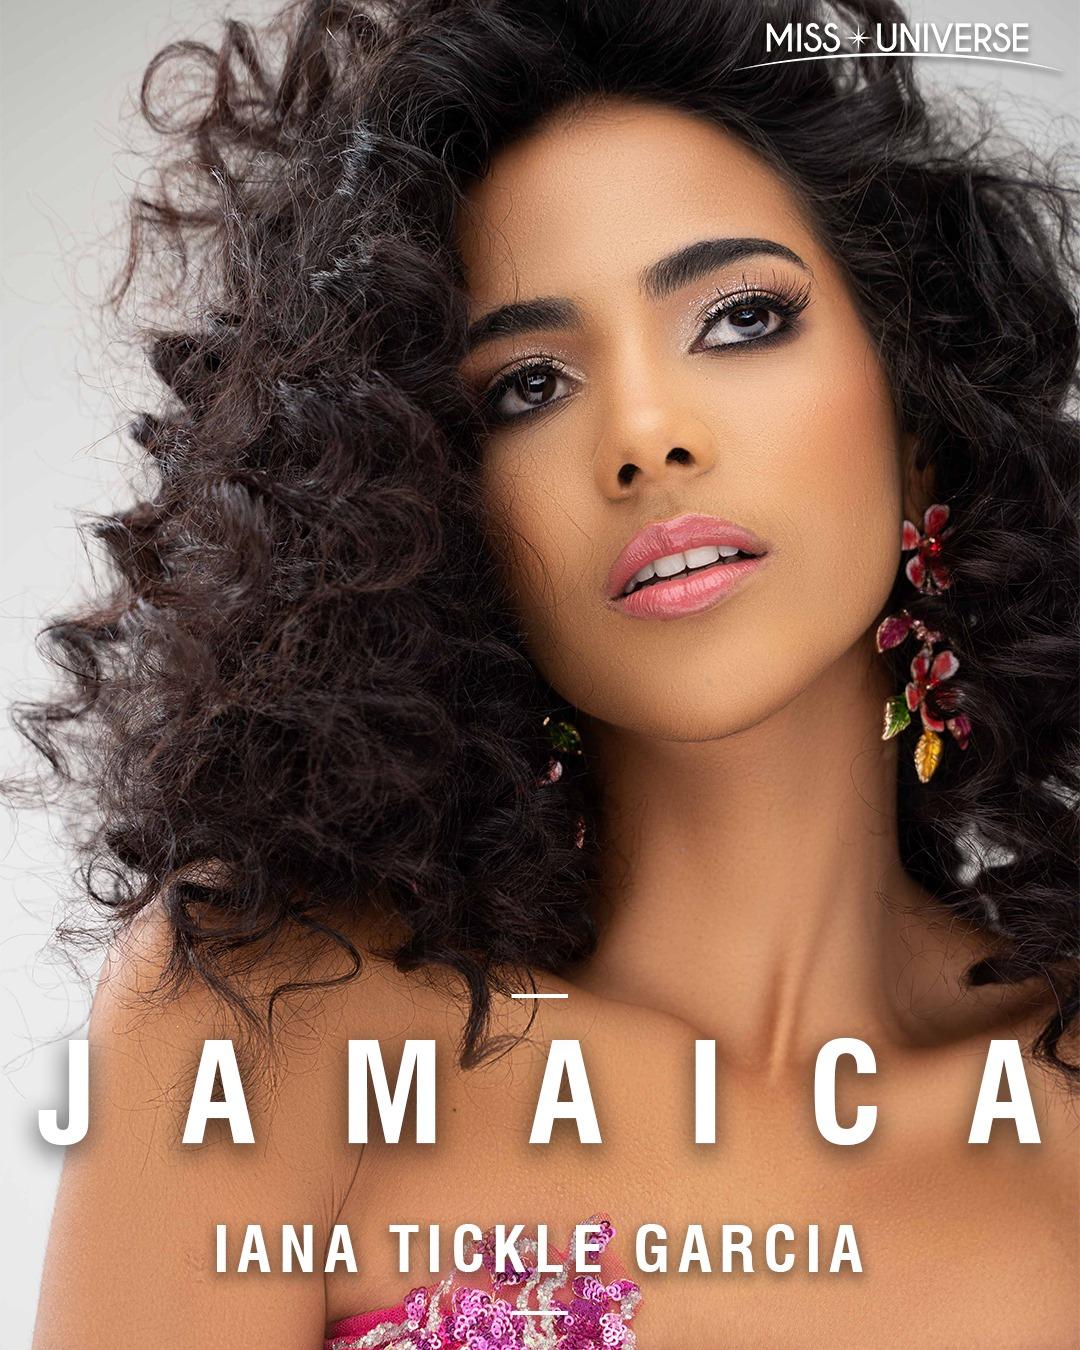 Iana Tickle Garcia (JAMAICA 2019) - Page 2 20